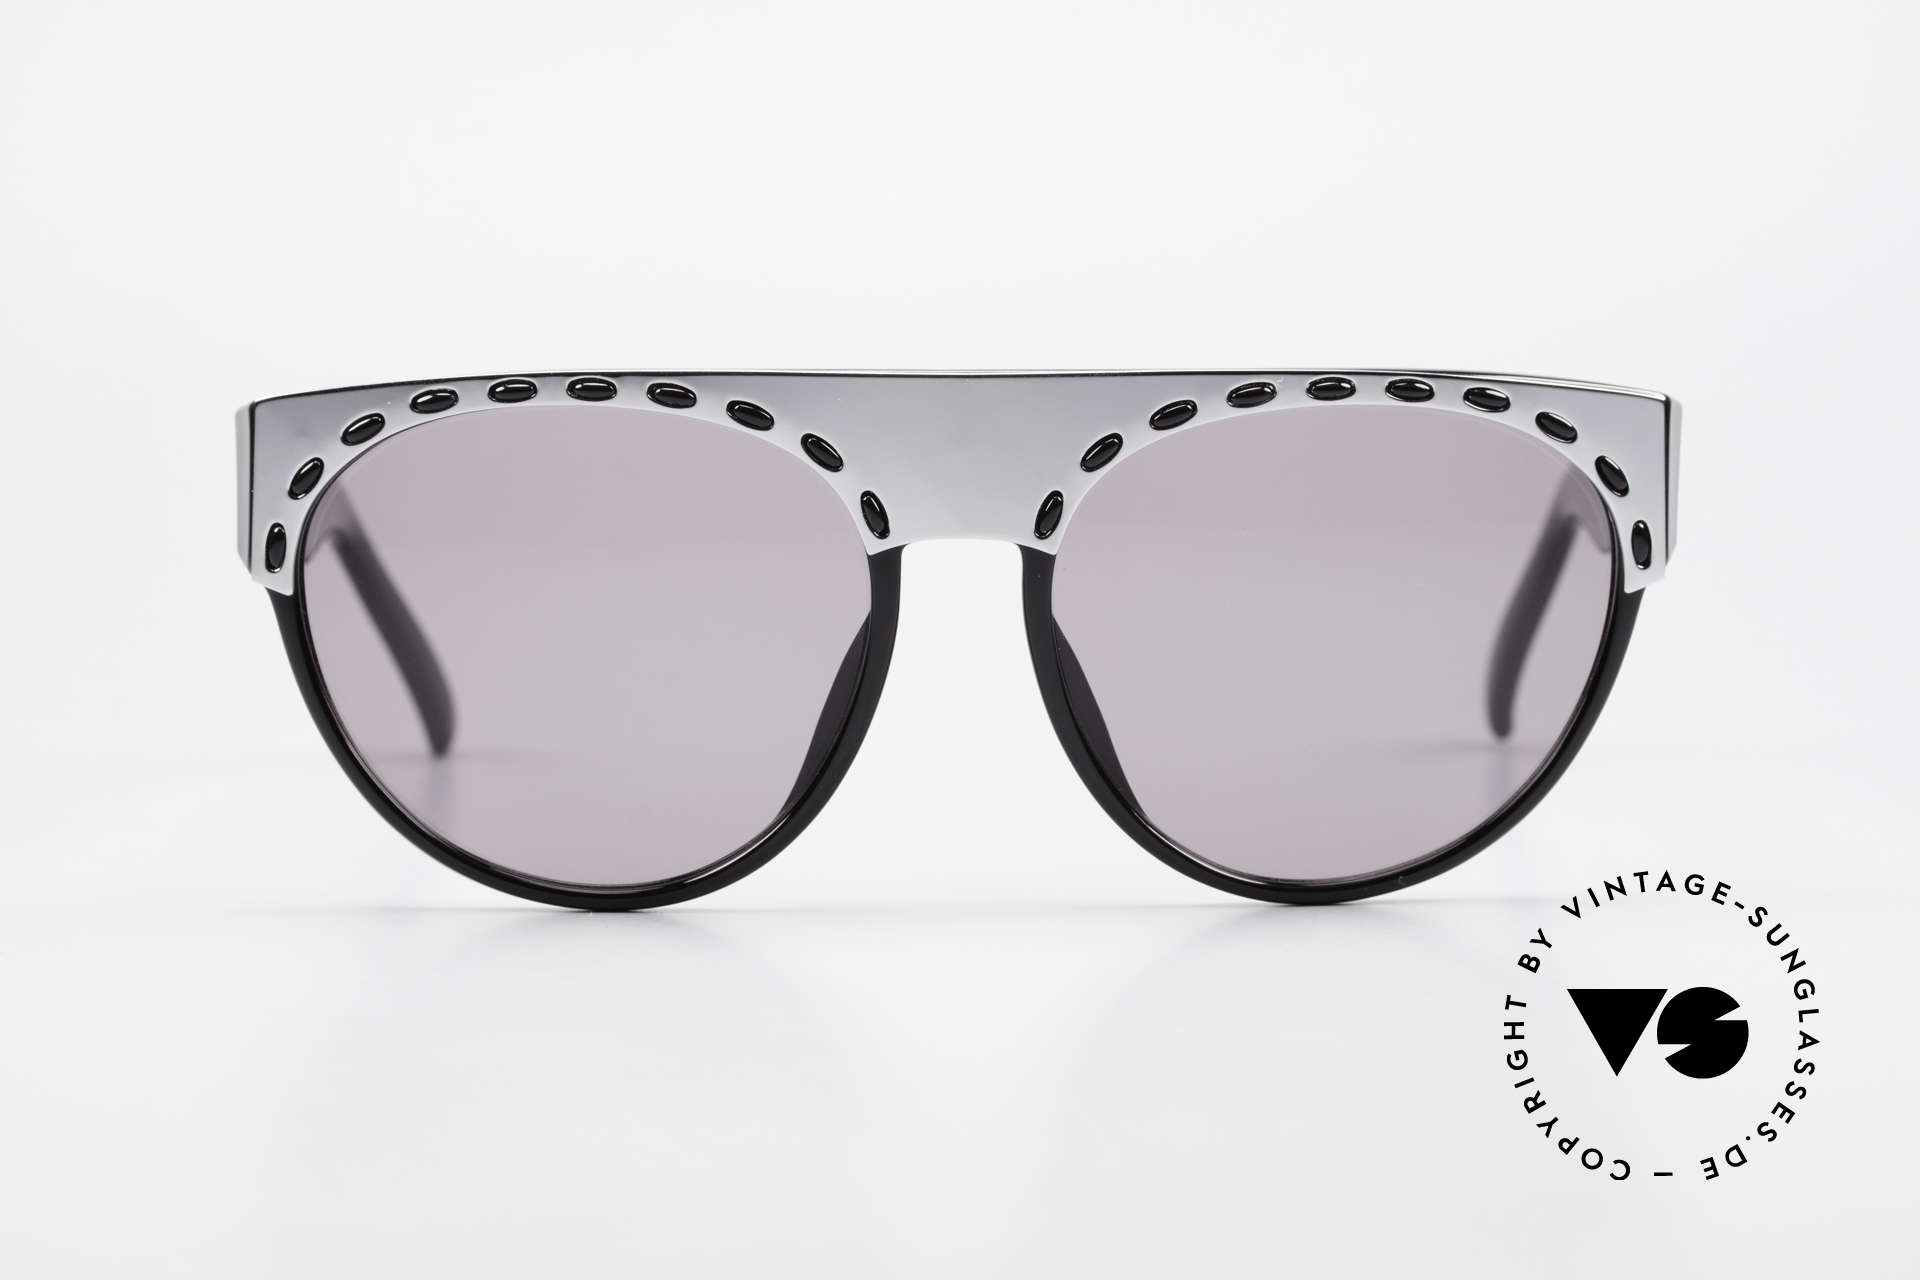 Christian Dior 2437 Ladies 80's Sunglasses Vintage, massive design (eye-catcher) in timeless classic black, Made for Women